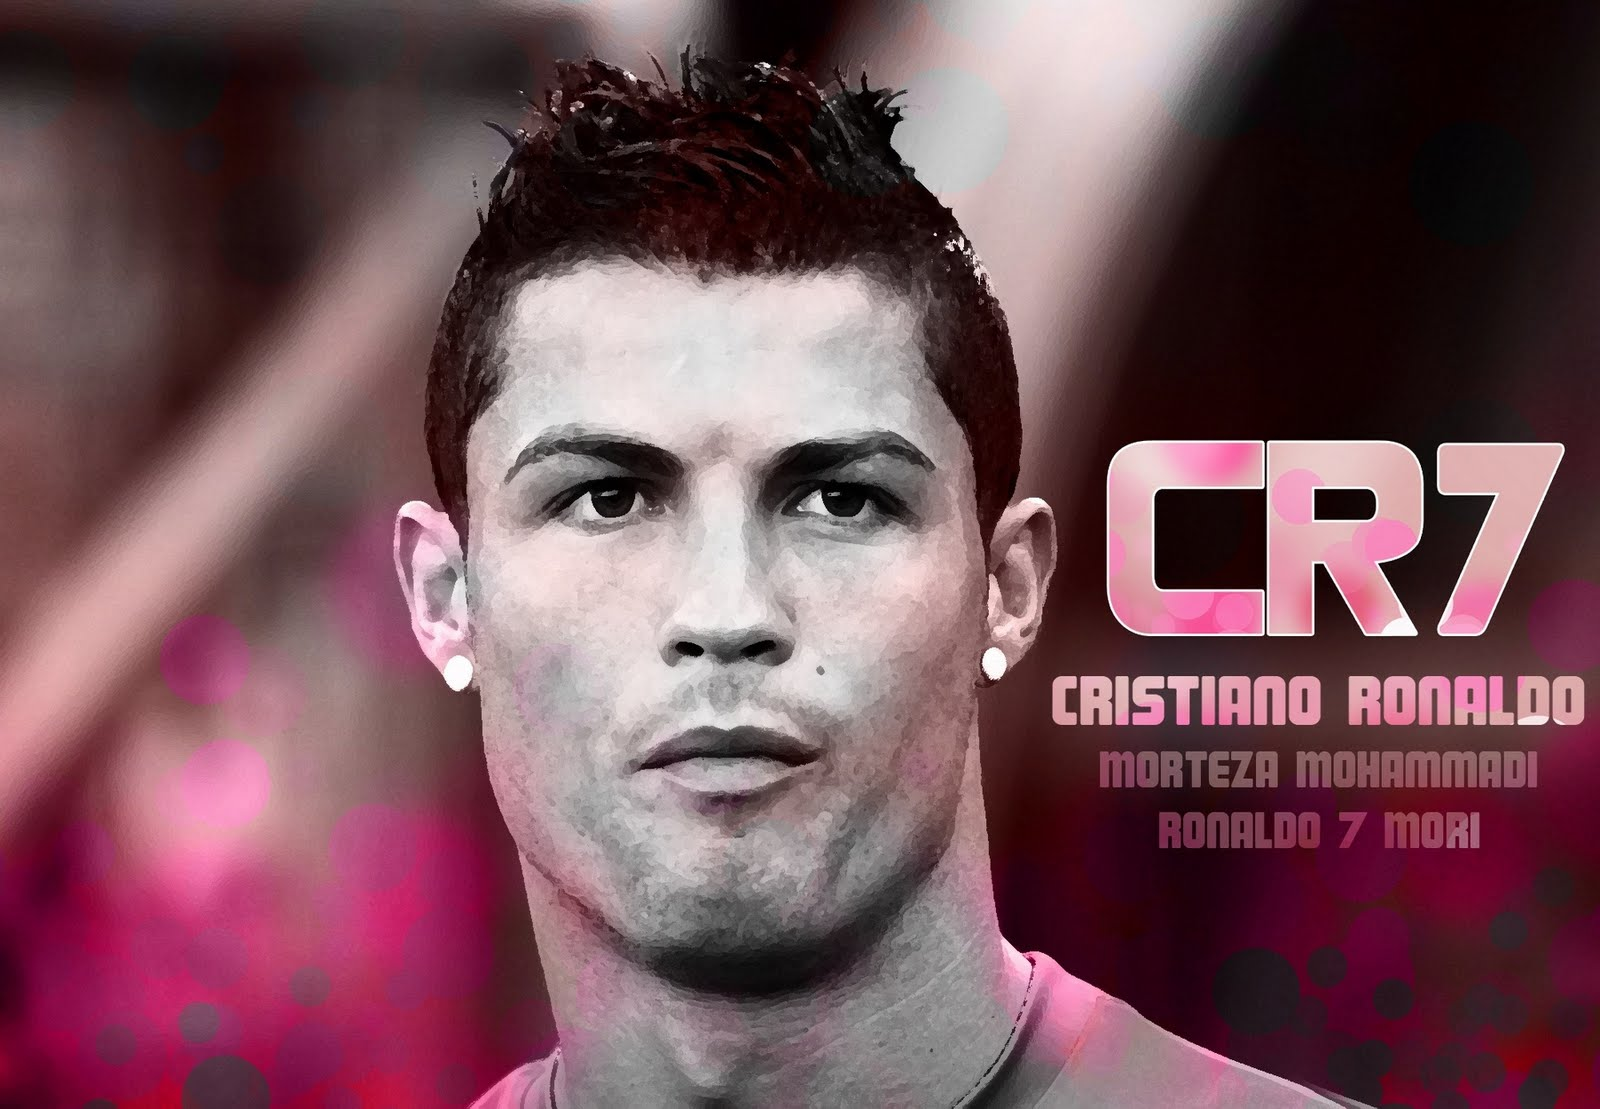 GARUDAS KNIGHT Christiano Ronaldo Wallpaper